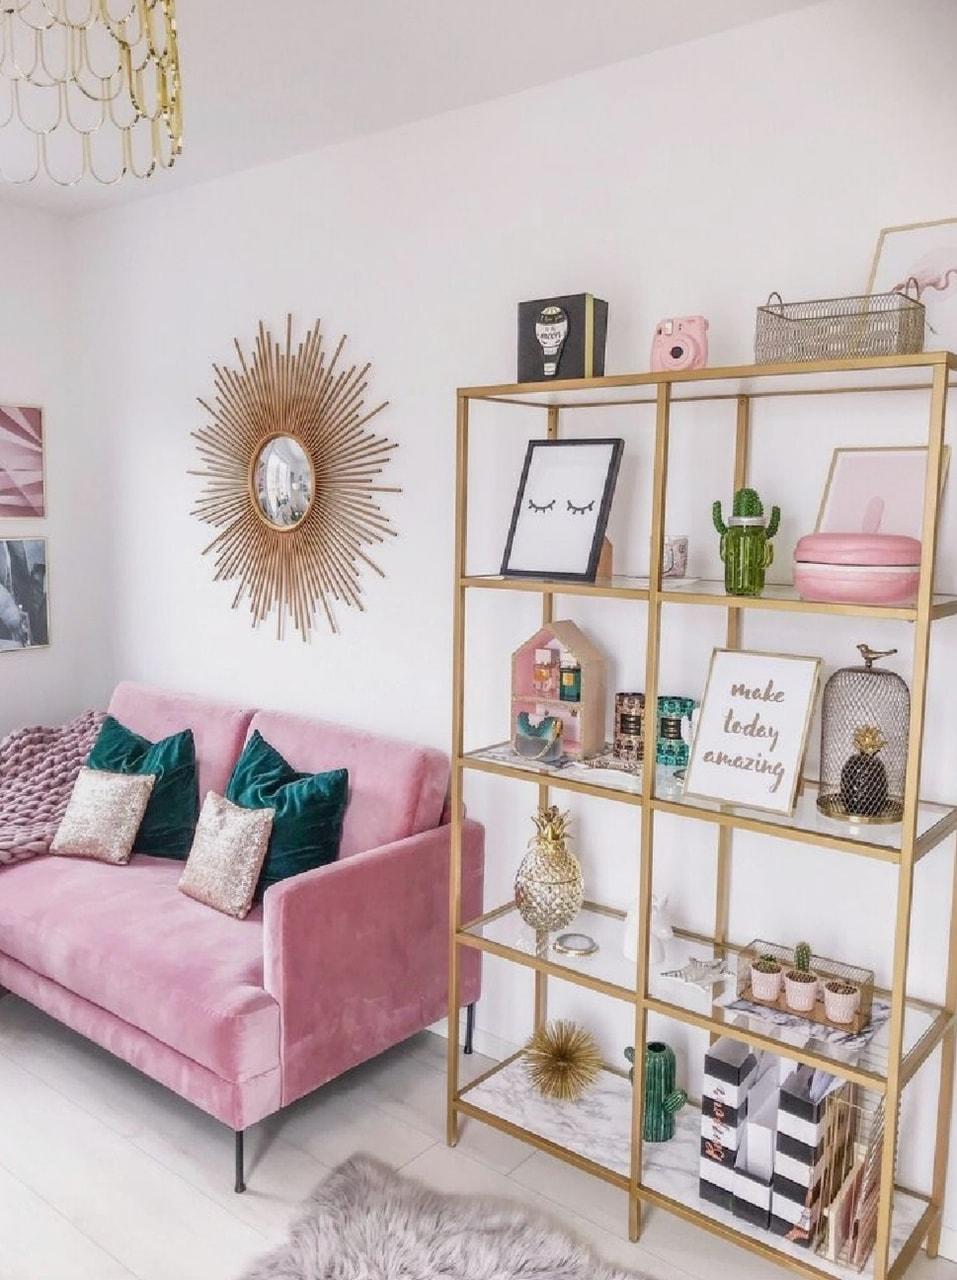 Tumblr Living Room Uploaded By 𝕵𝖆𝖘𝖒𝖎𝖓𝖊